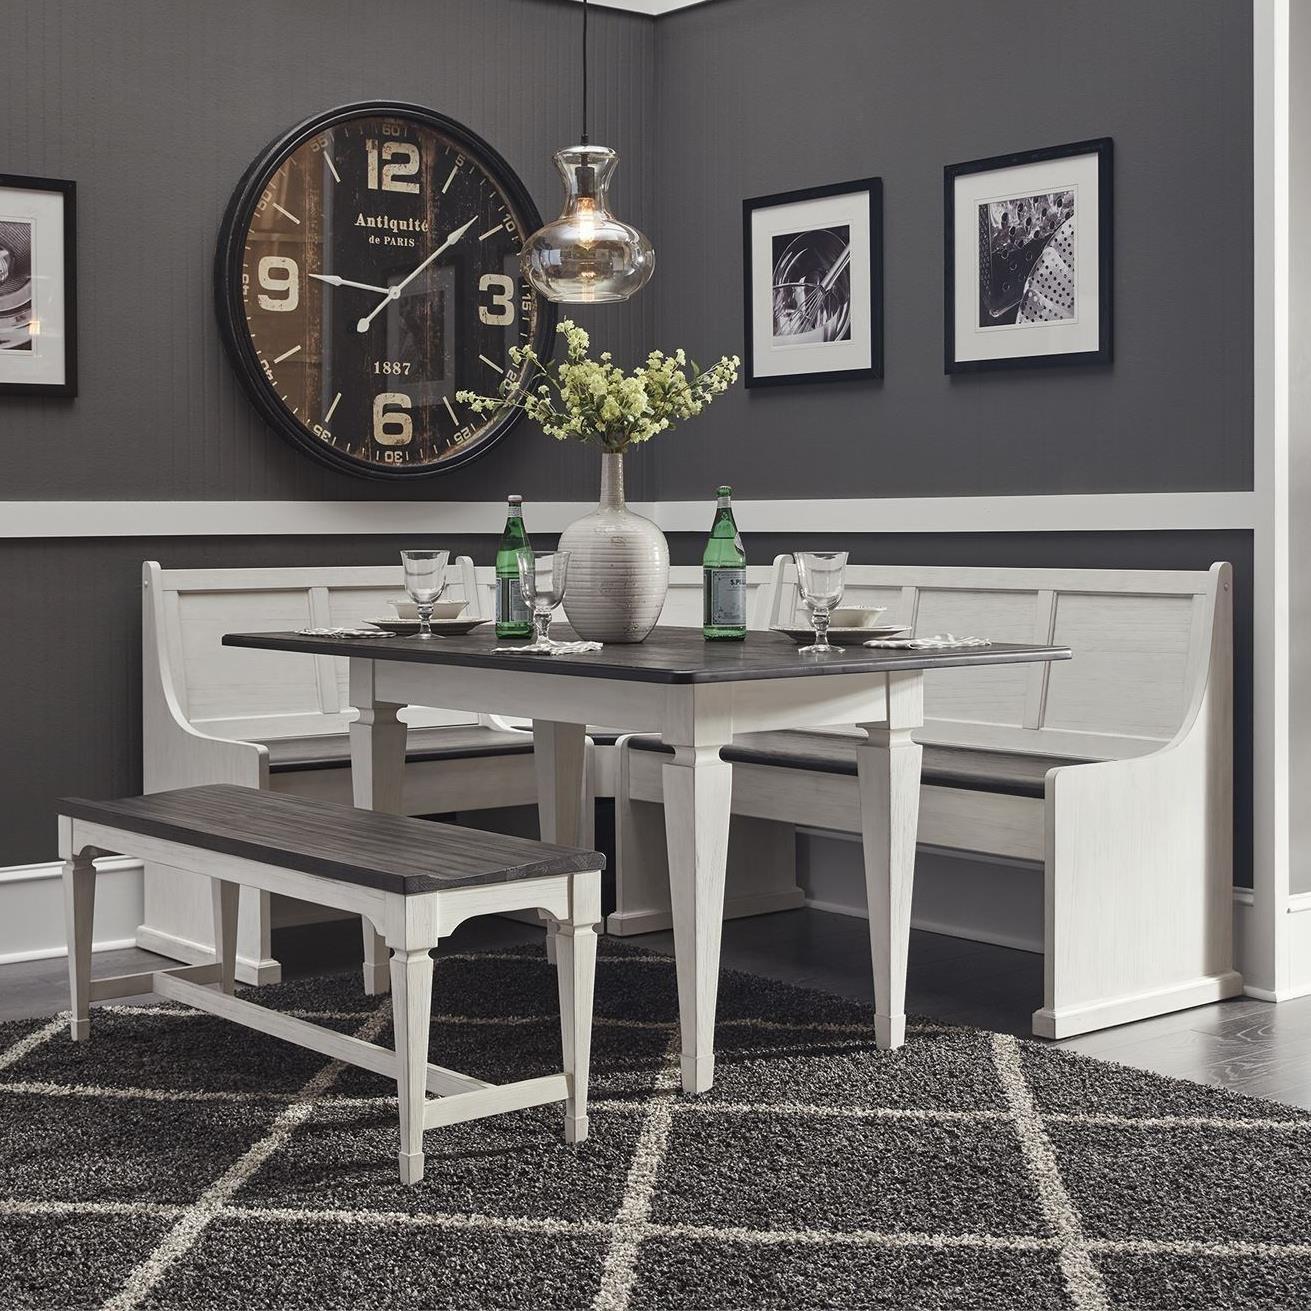 Transitional 5-Piece Nook Leg Table Set